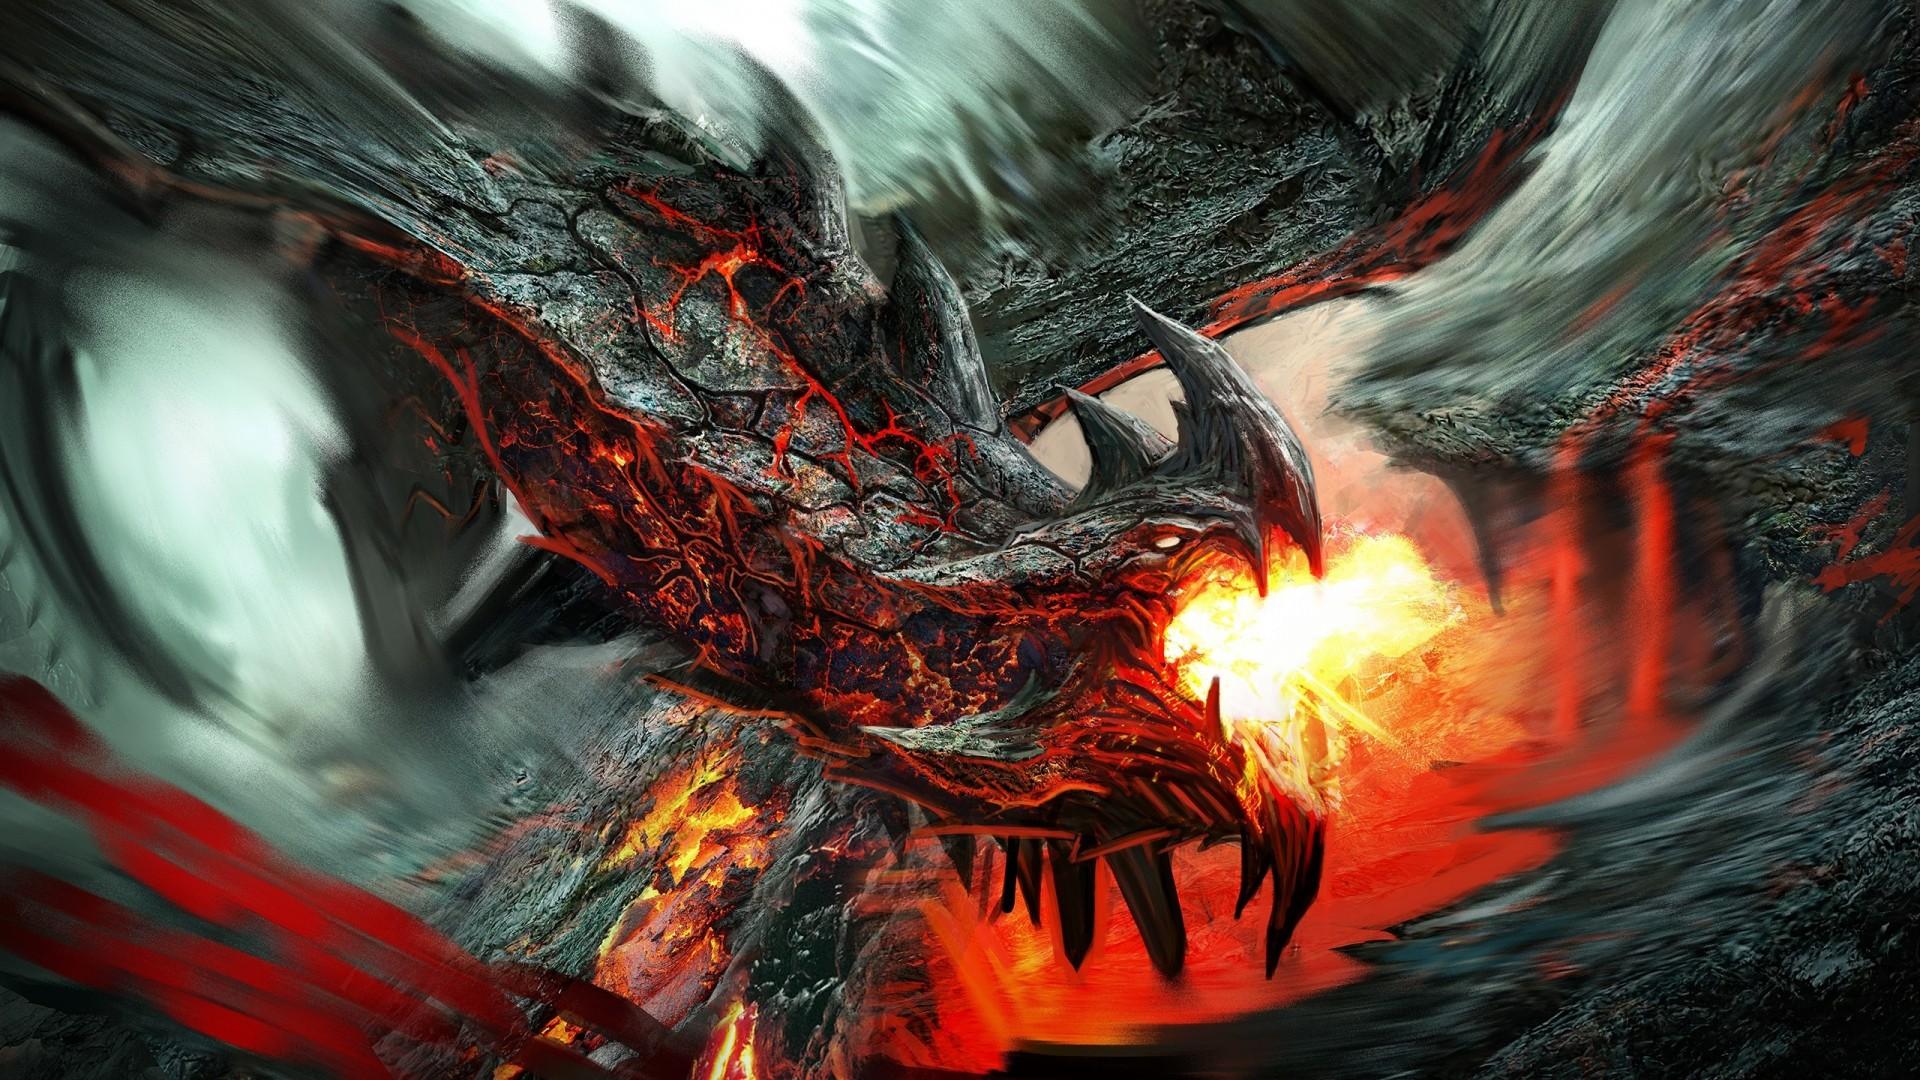 Preview wallpaper dragon, fire-breathing, flame, art 1920×1080